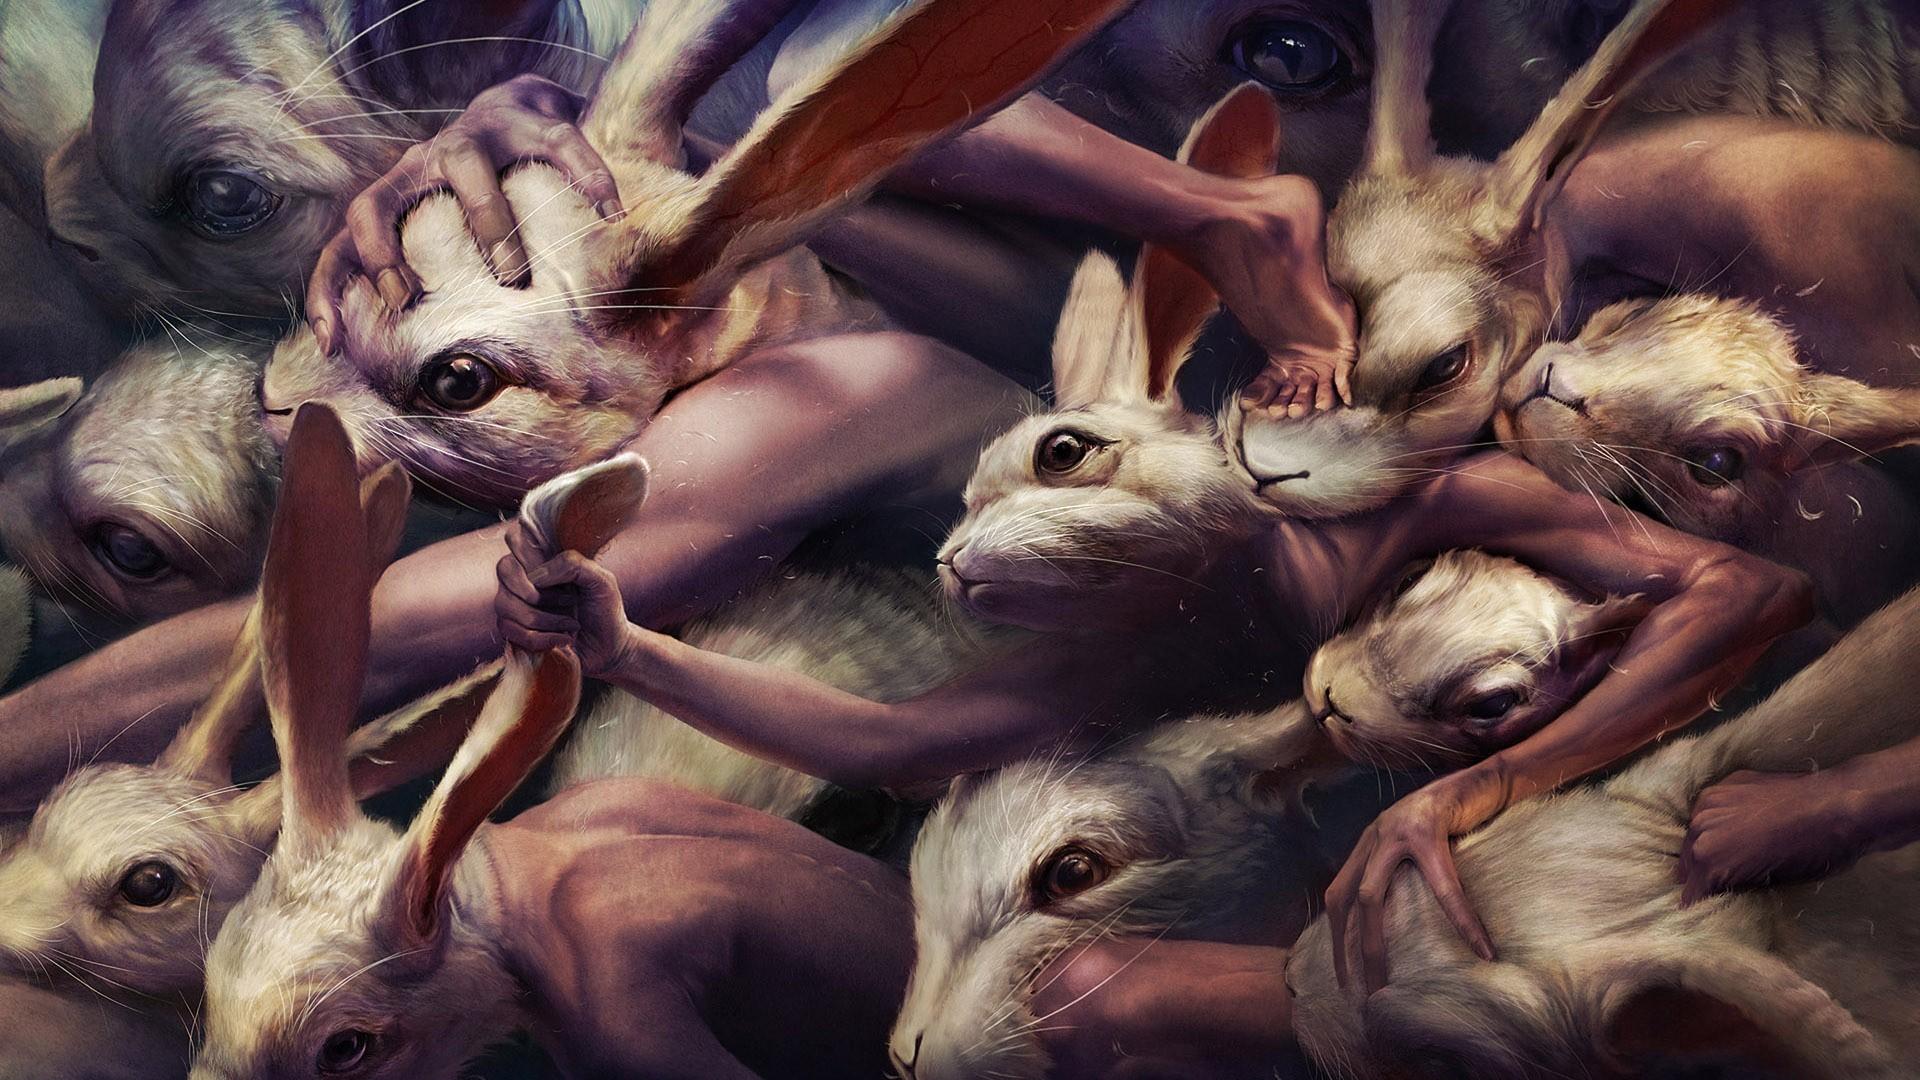 General 1920x1080 fantasy art creepy rabbits people artwork